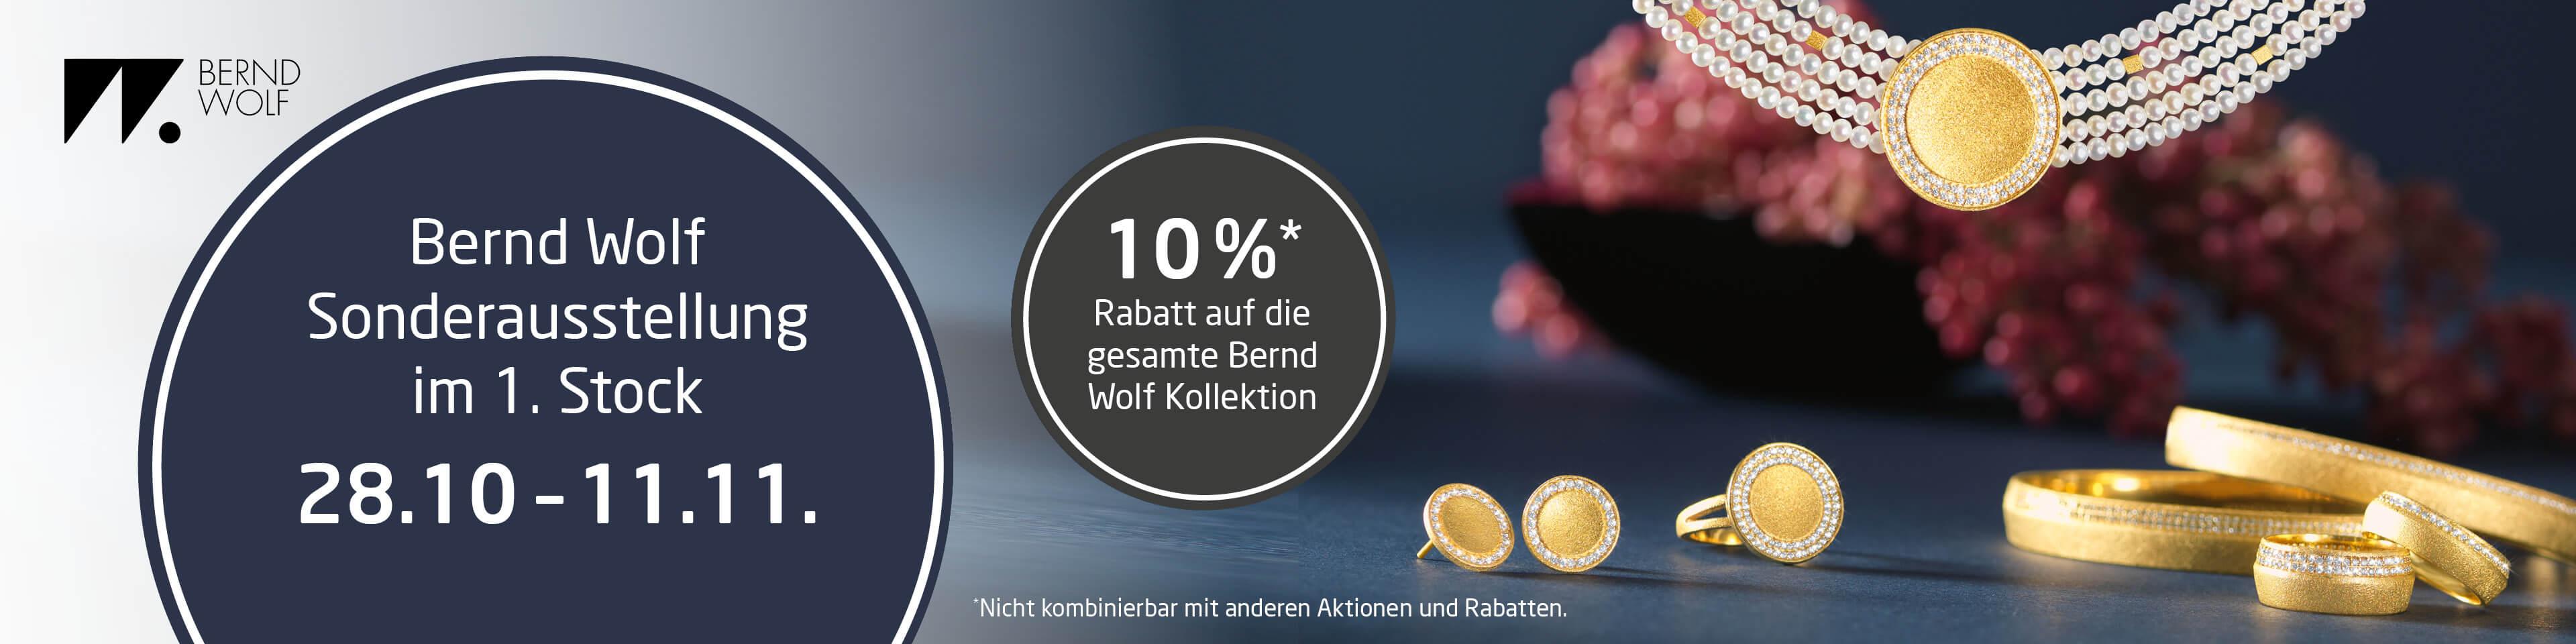 CHARISMA-1709-046-AD-Charisma-Ausstellung-Bernd-Wolf-Slider-Home-01